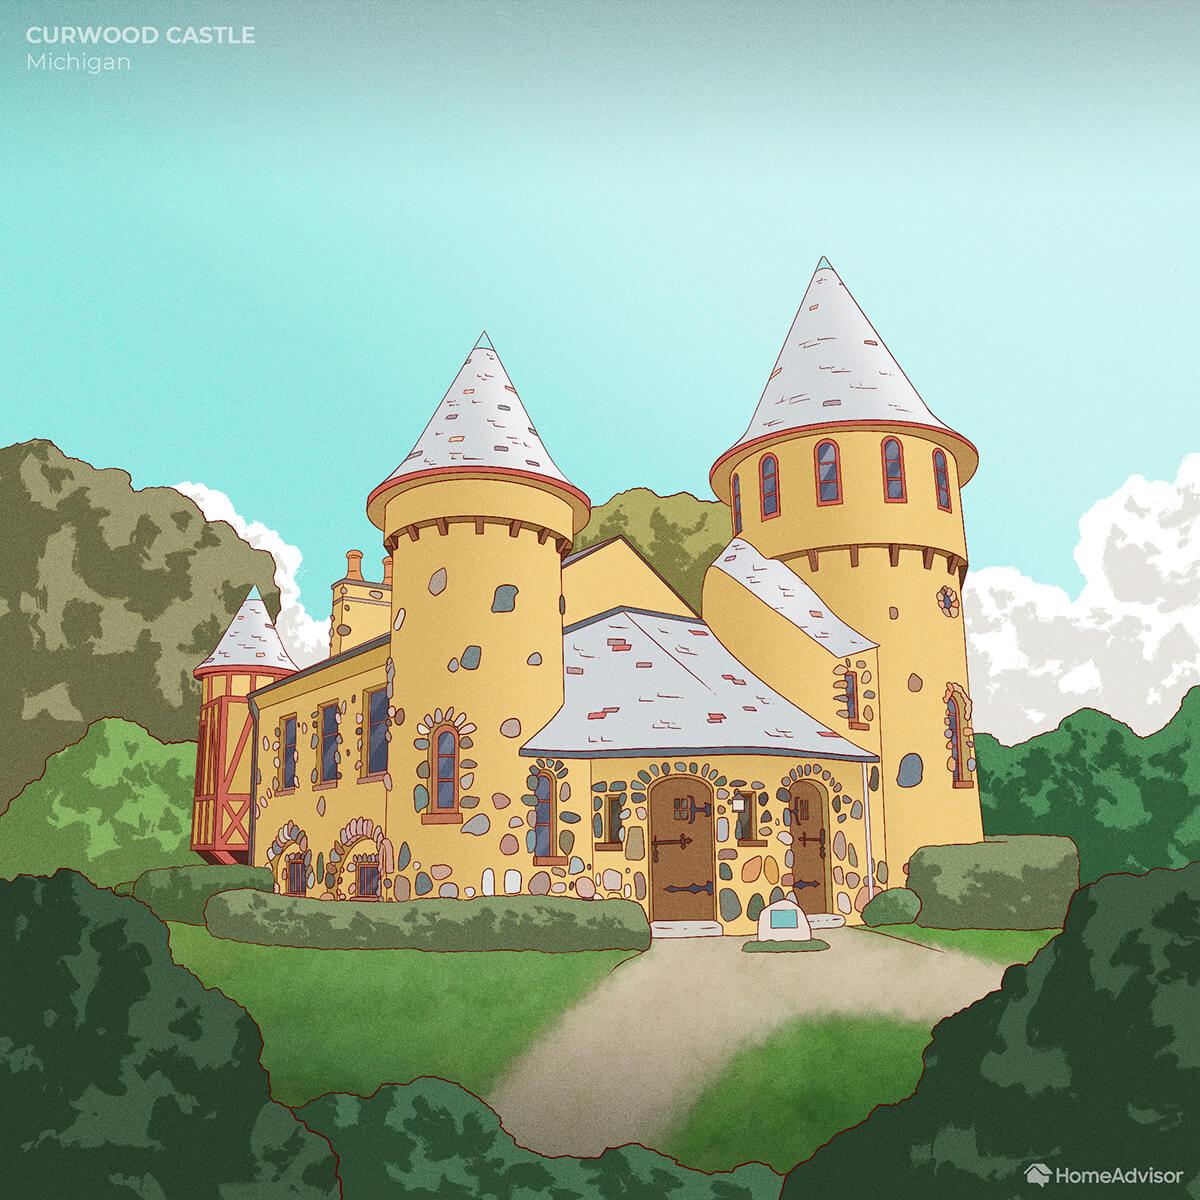 Curwood Castle